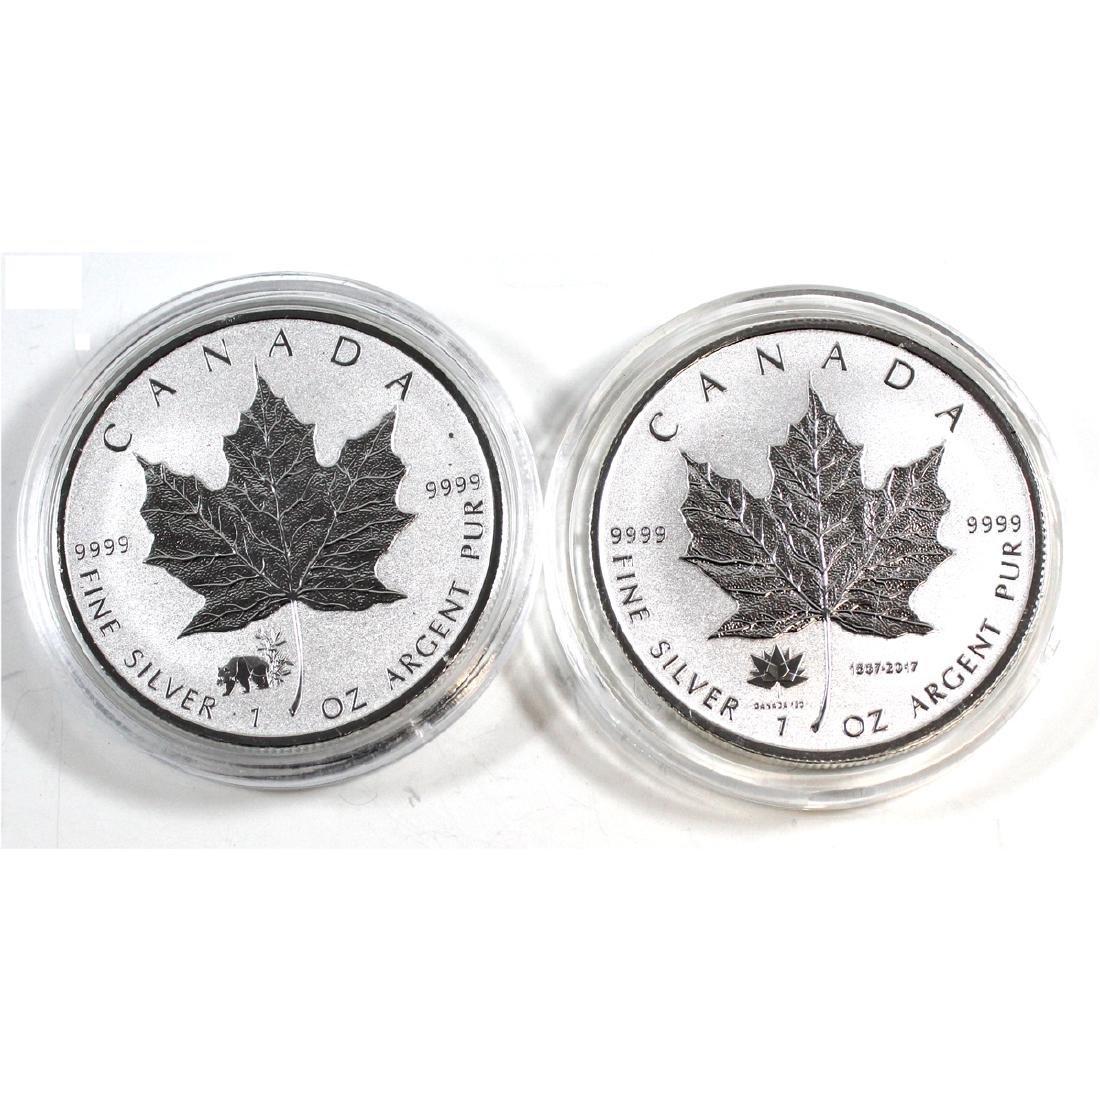 Pair of 2017 Canada $5 1oz. .999 Fine Silver Maple